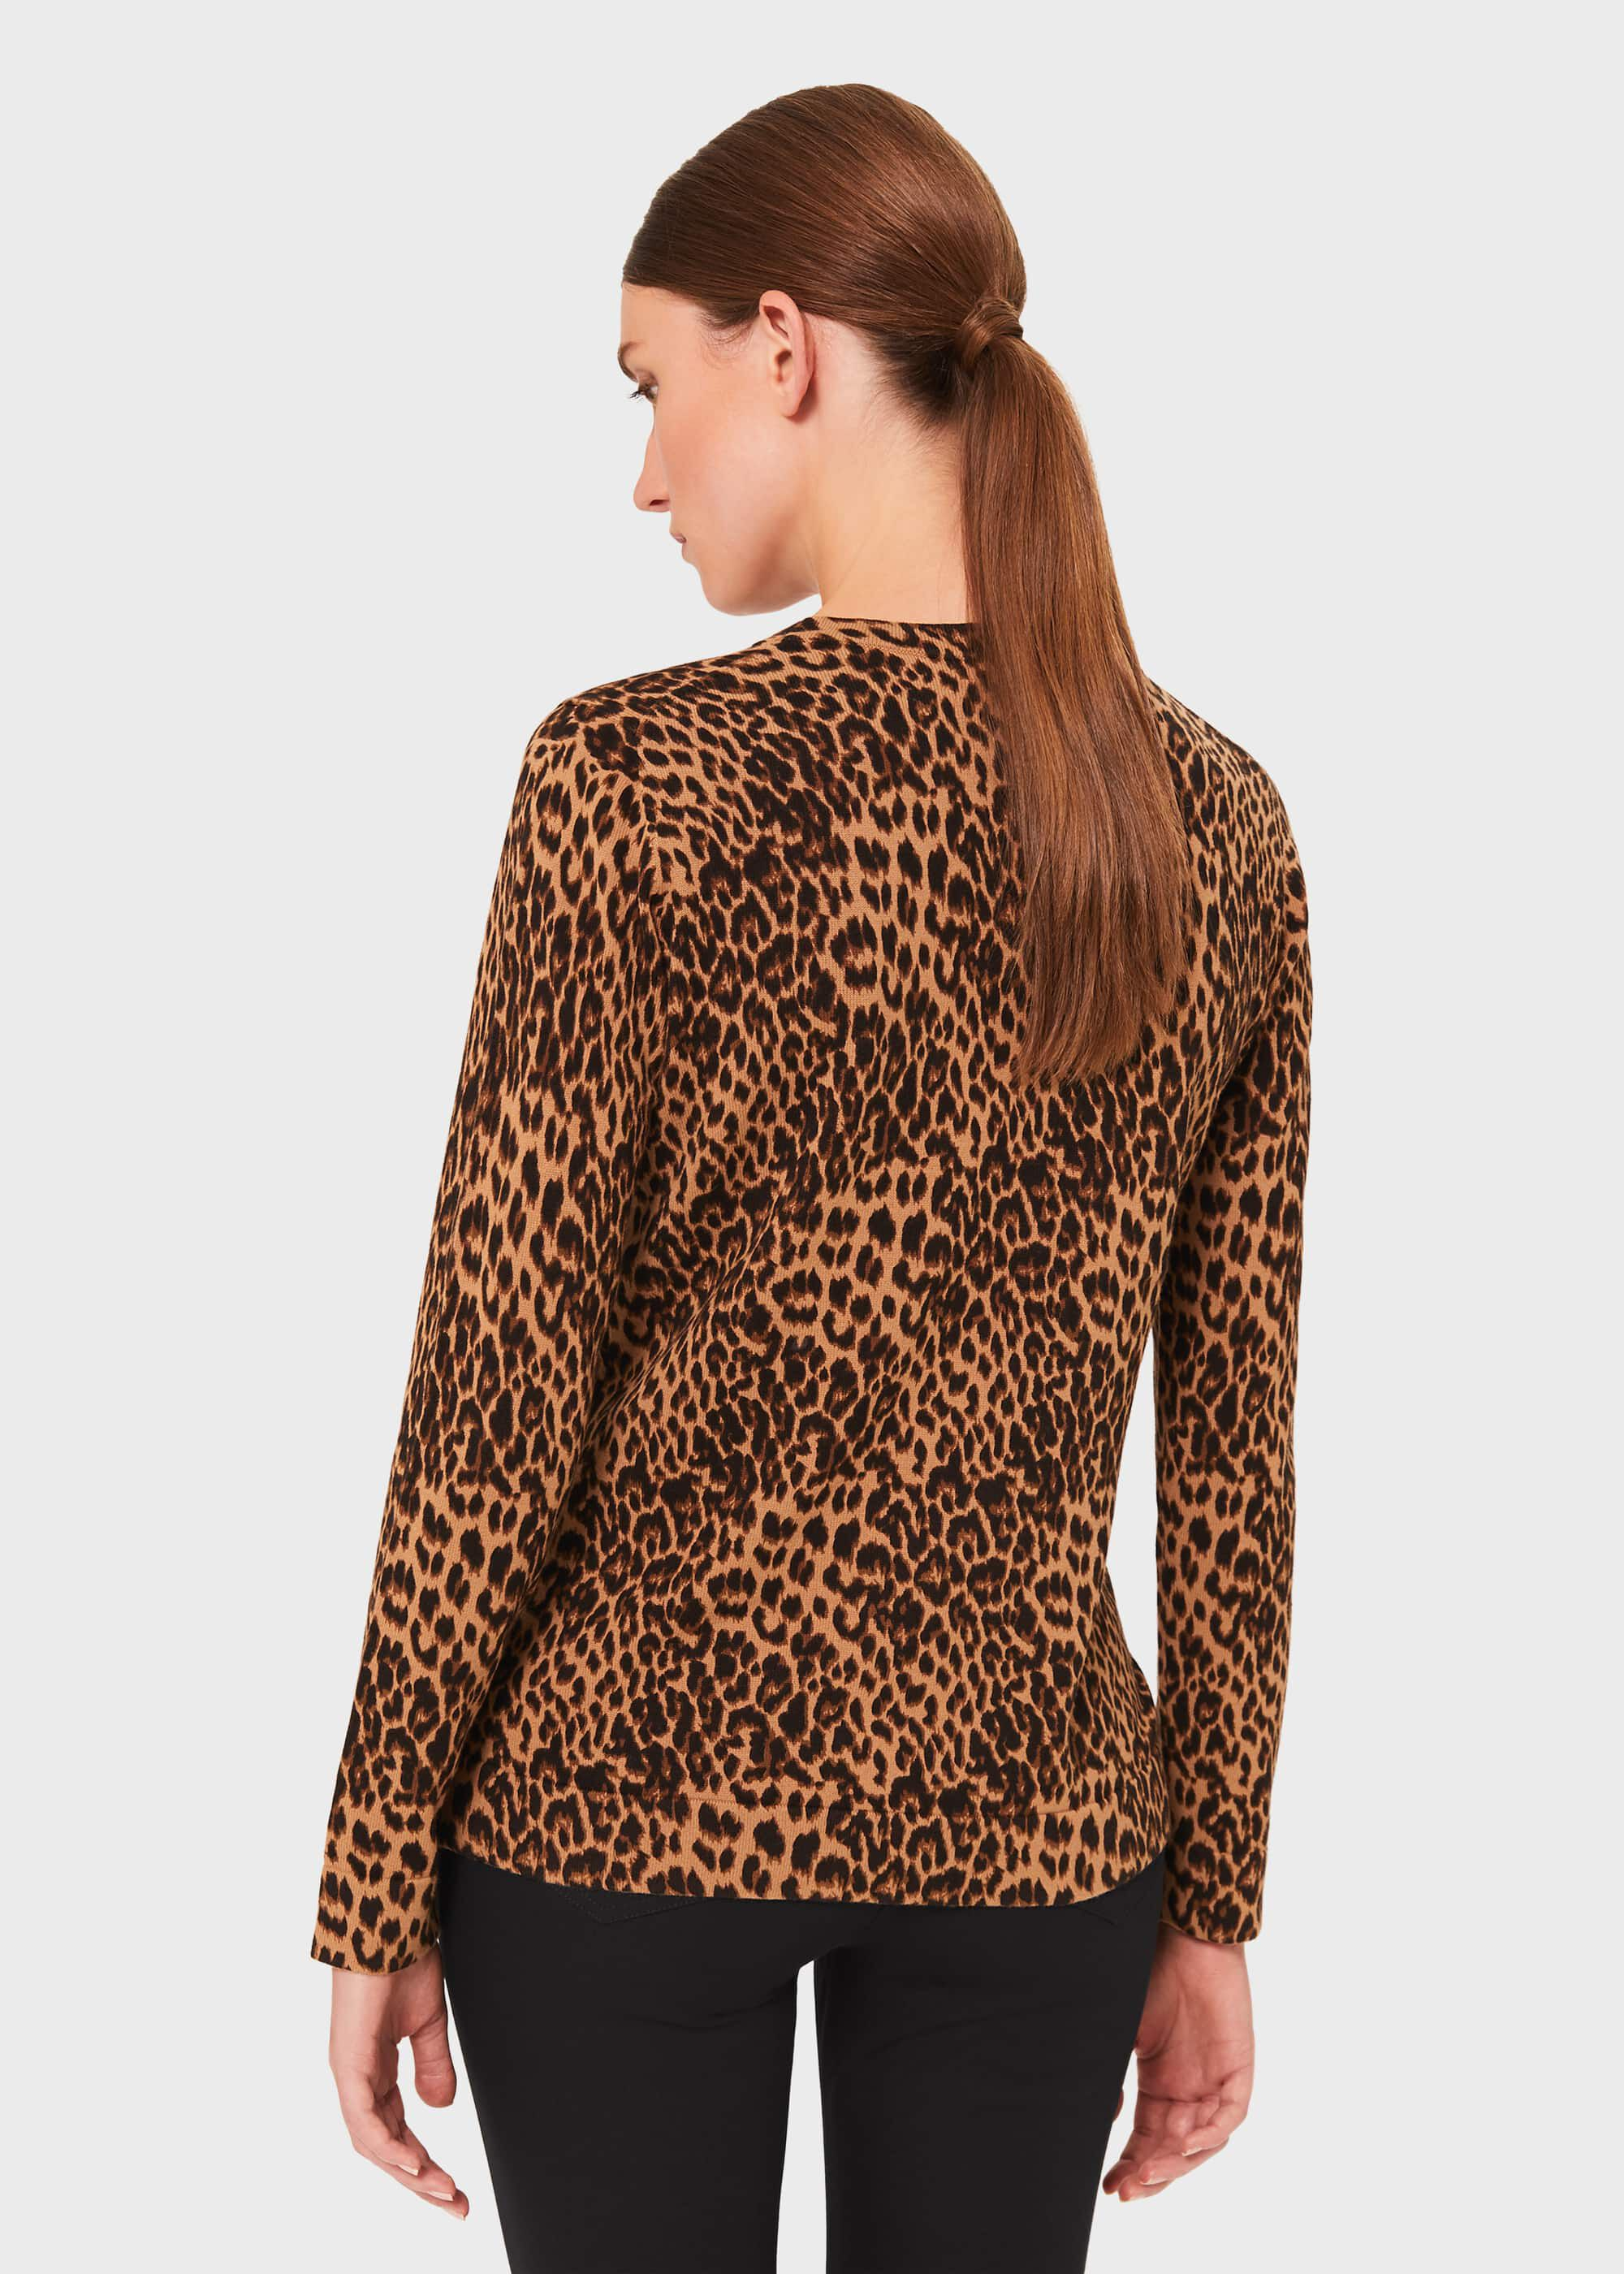 Pamela Cotton Animal Print Sweater